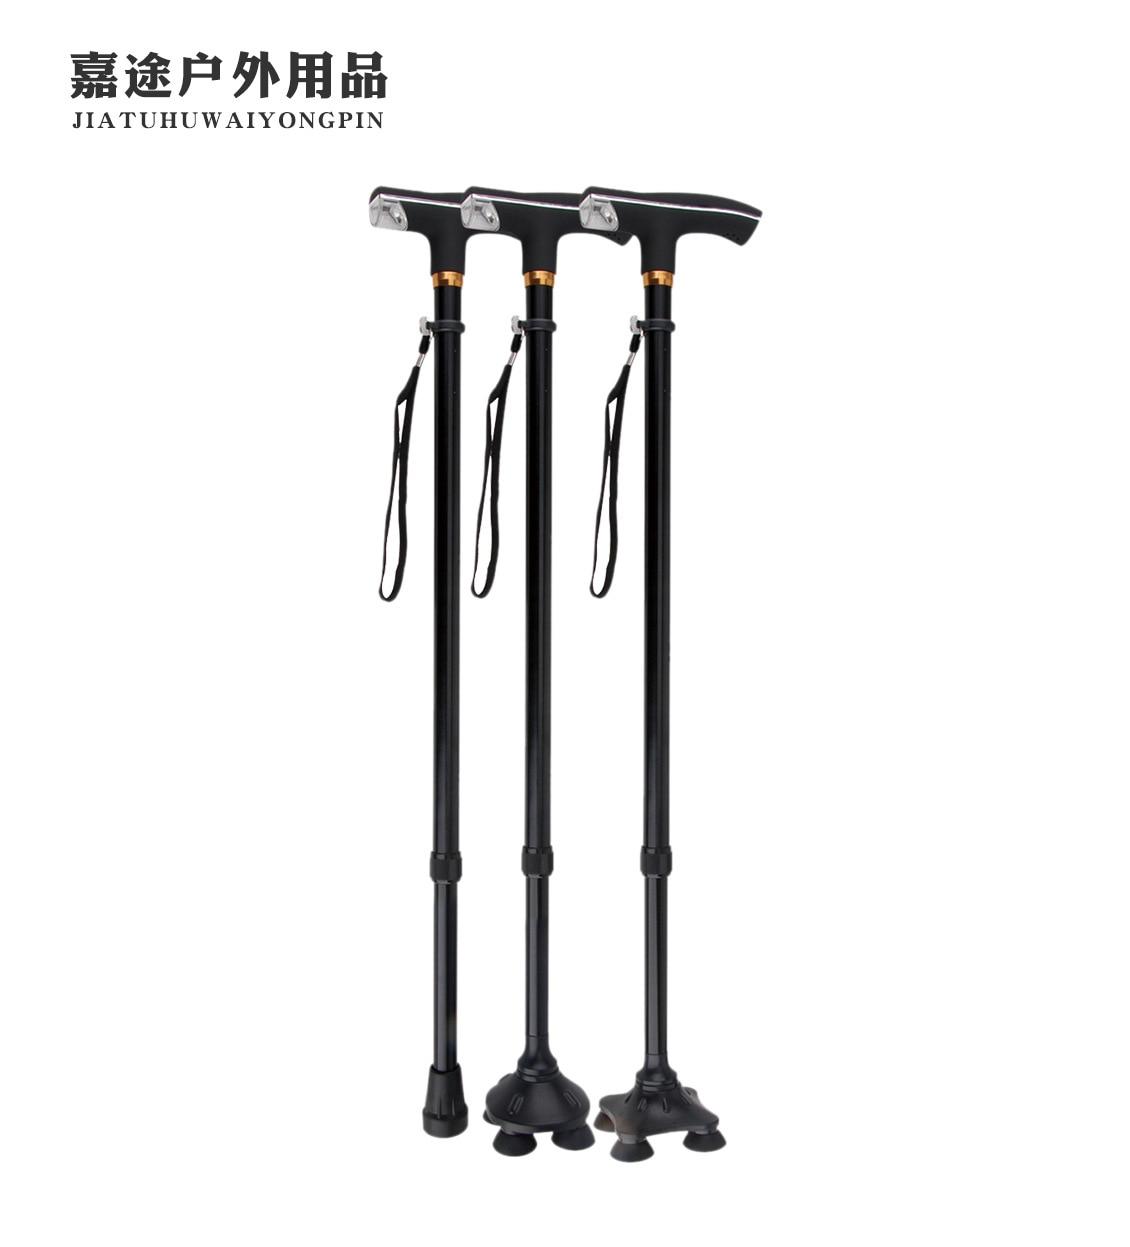 450G Walking Stick For The Elderly Four Corners Anti-slip Walking Stick Dull Polish Wearable Elderly Stick Adjustable LED Light